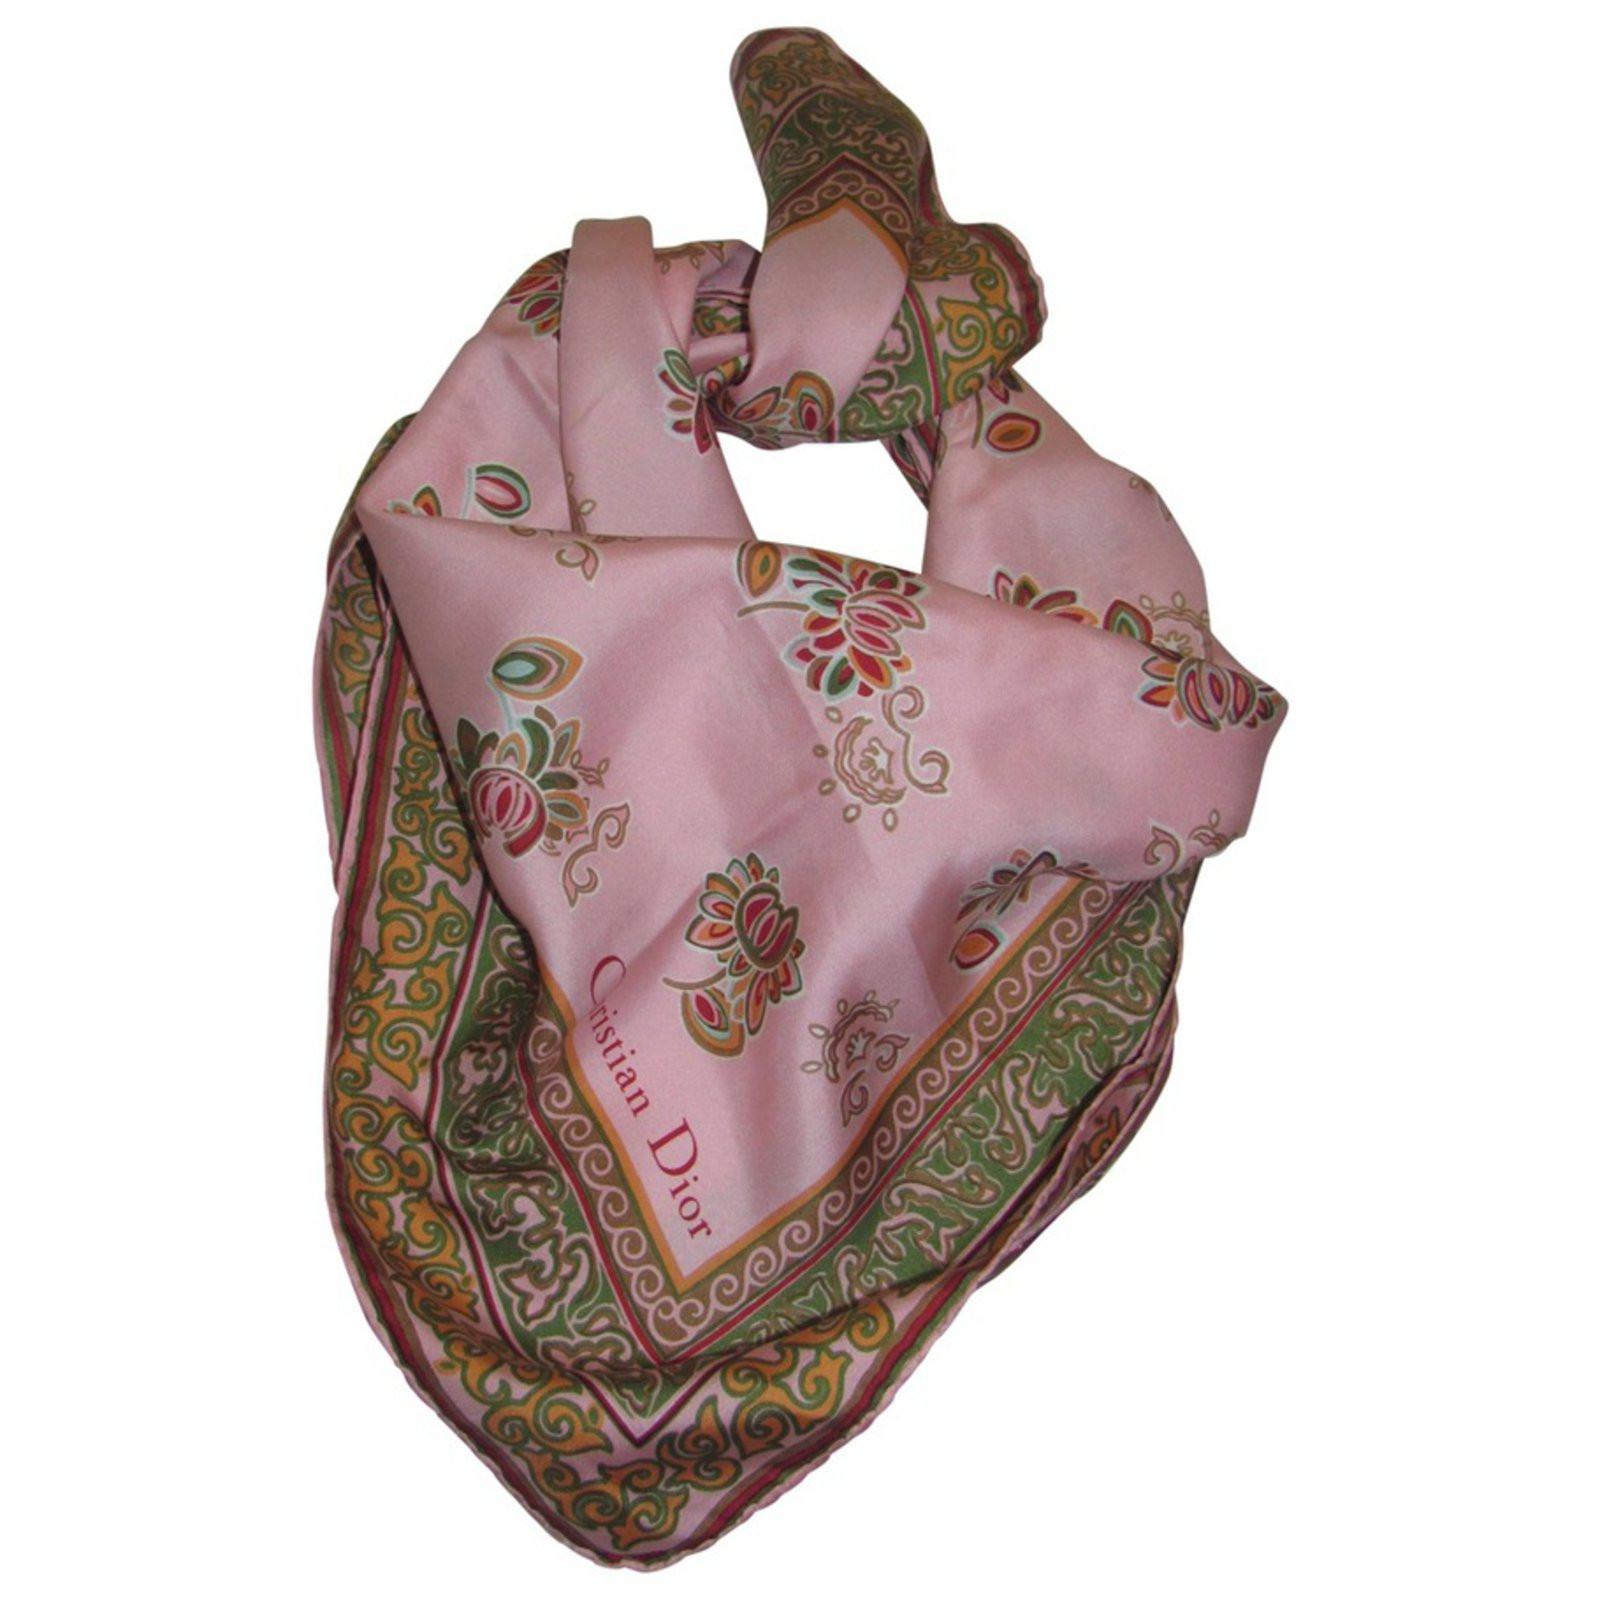 edbdd525c148 Foulards Dior Foulard Soie Rose ref.27704 - Joli Closet